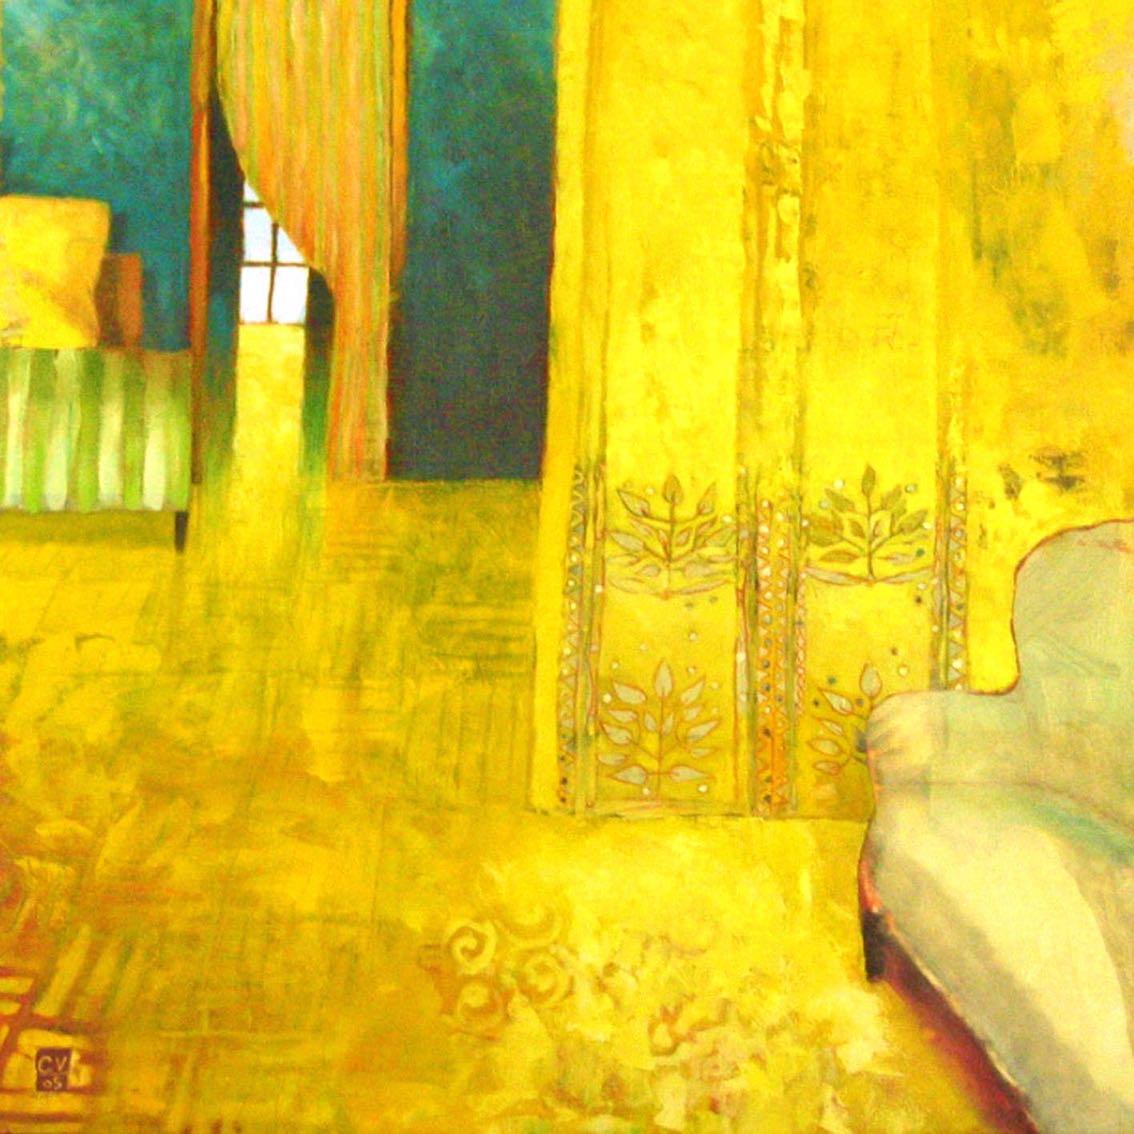 Salon jaune - 2005. 100X100 cm